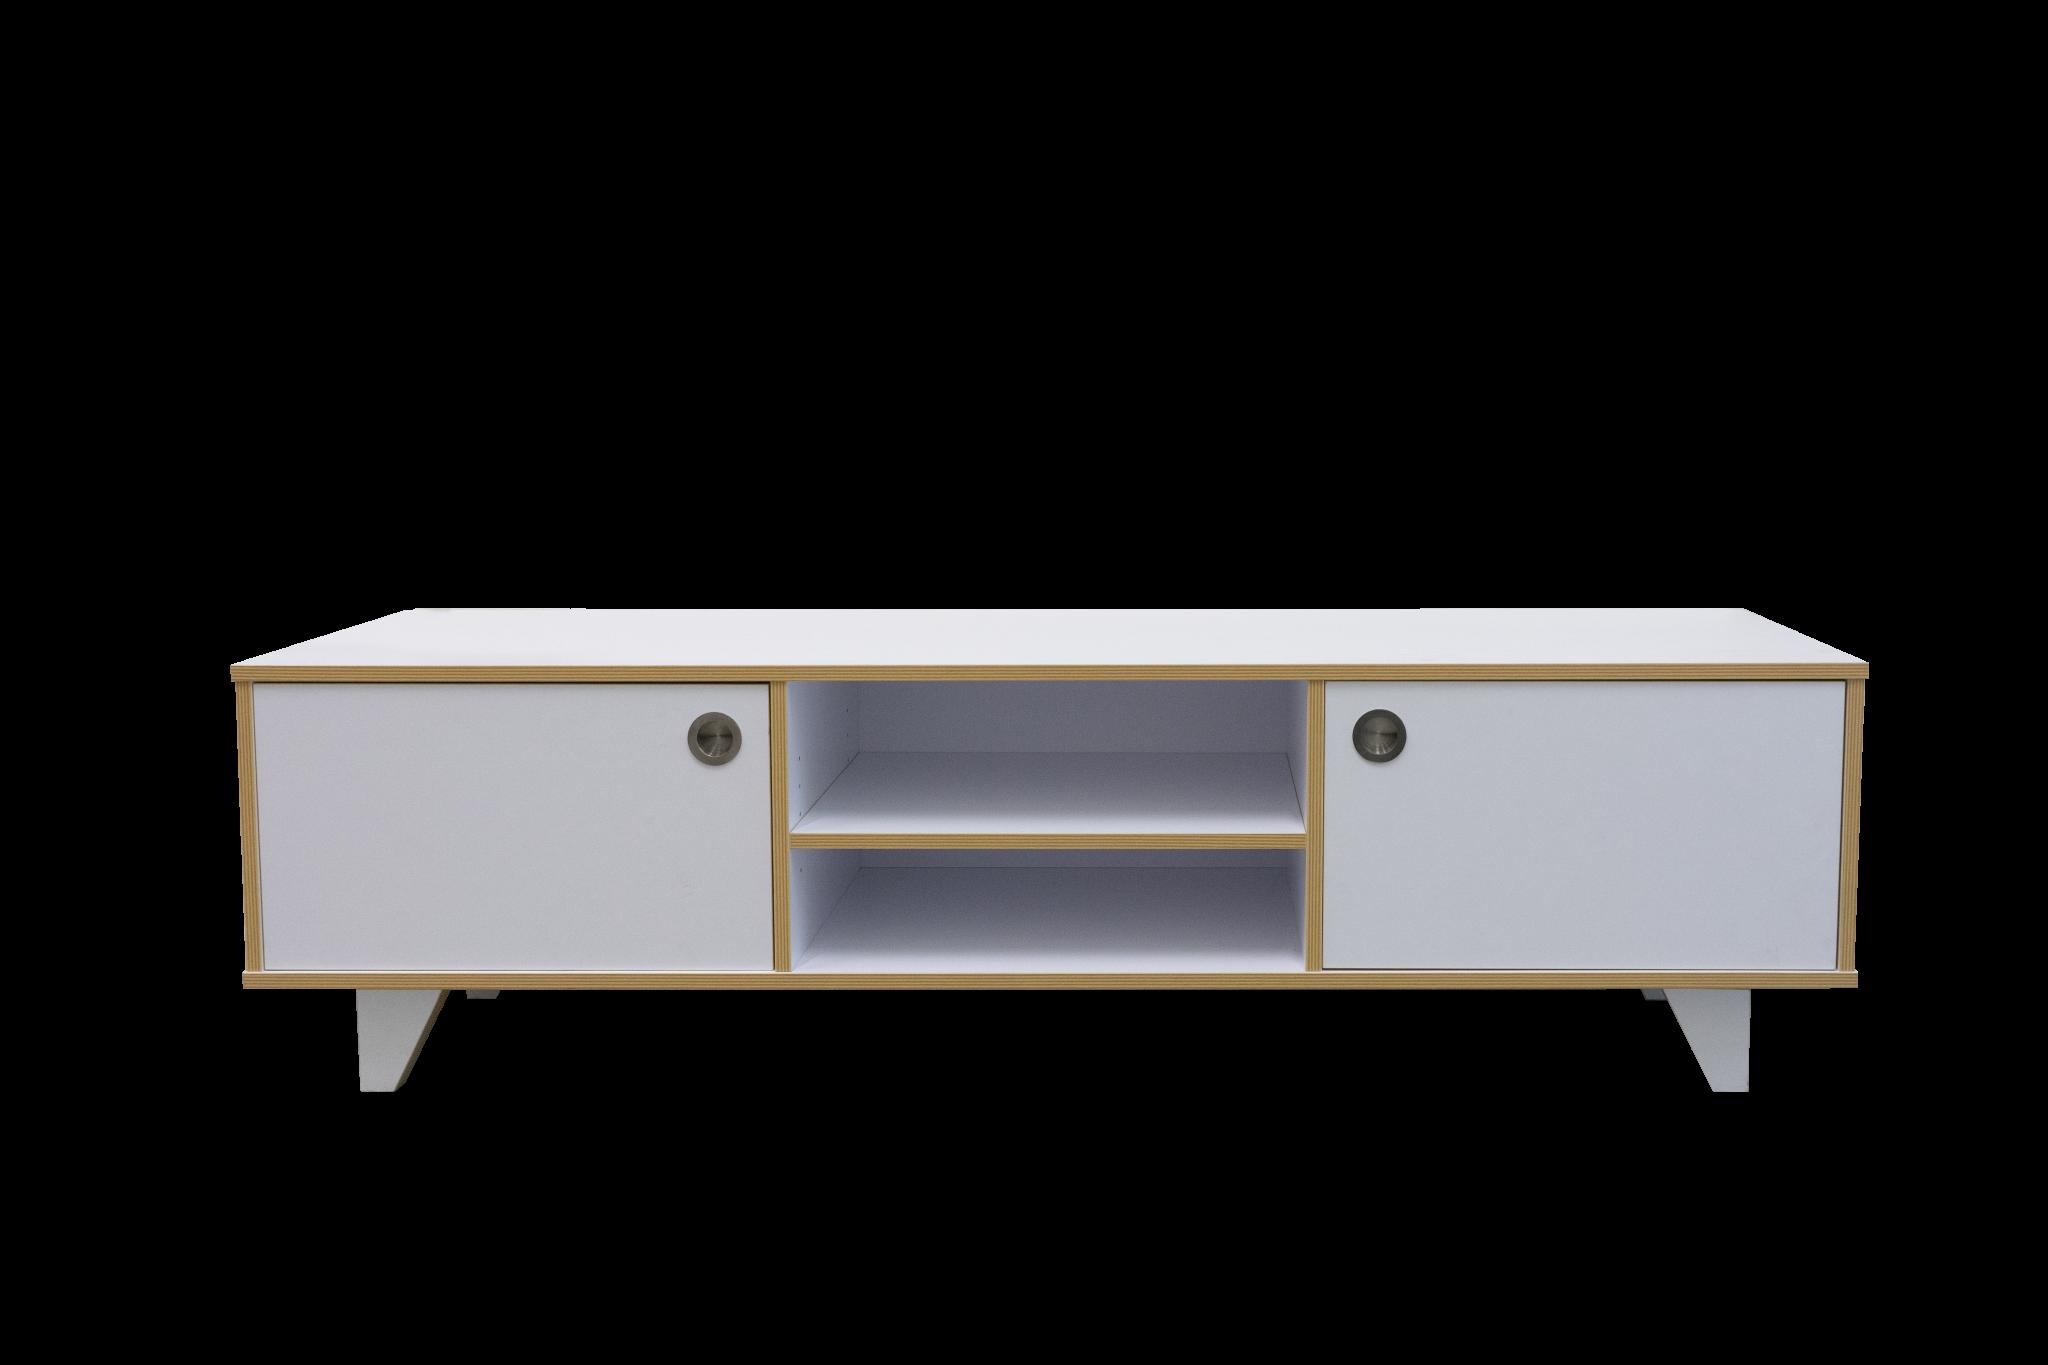 DSC00952.png